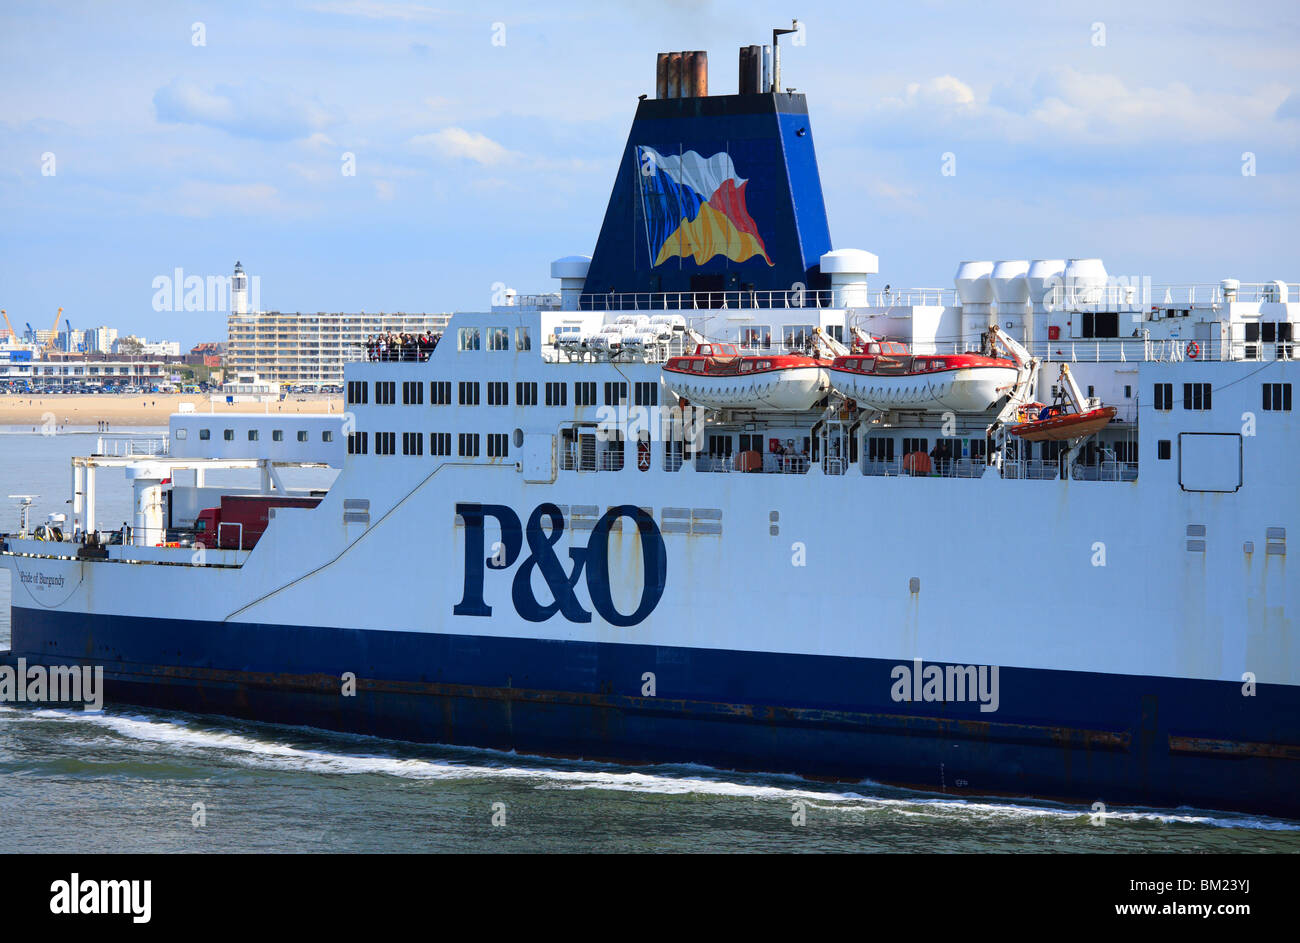 P&O Ferries, Pride of Burgundy, leaving Calais. - Stock Image